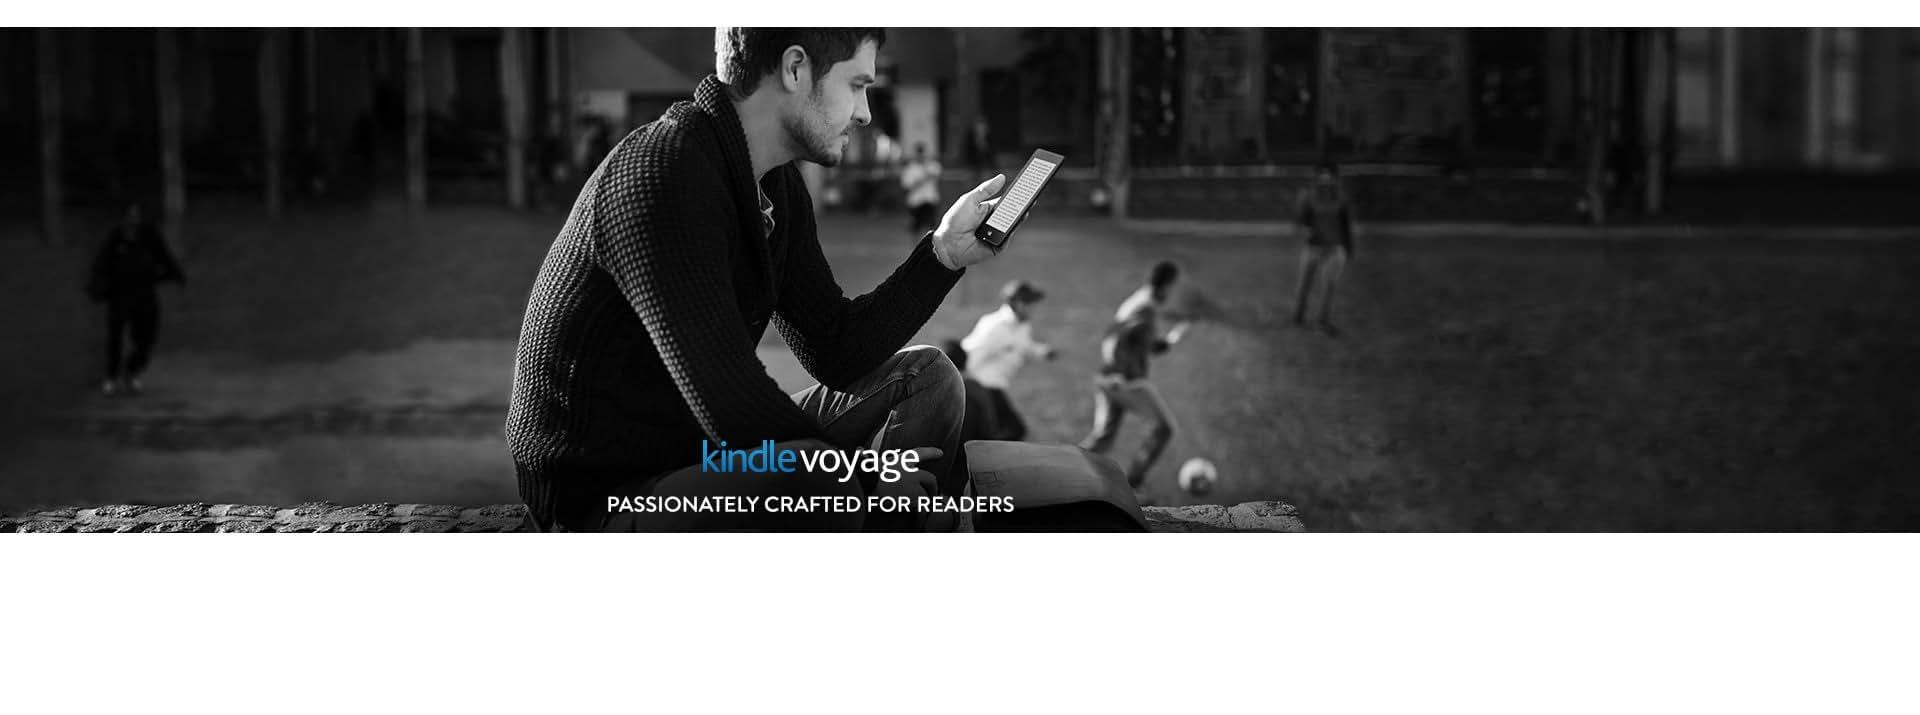 kindle voyage e reader amazon official site